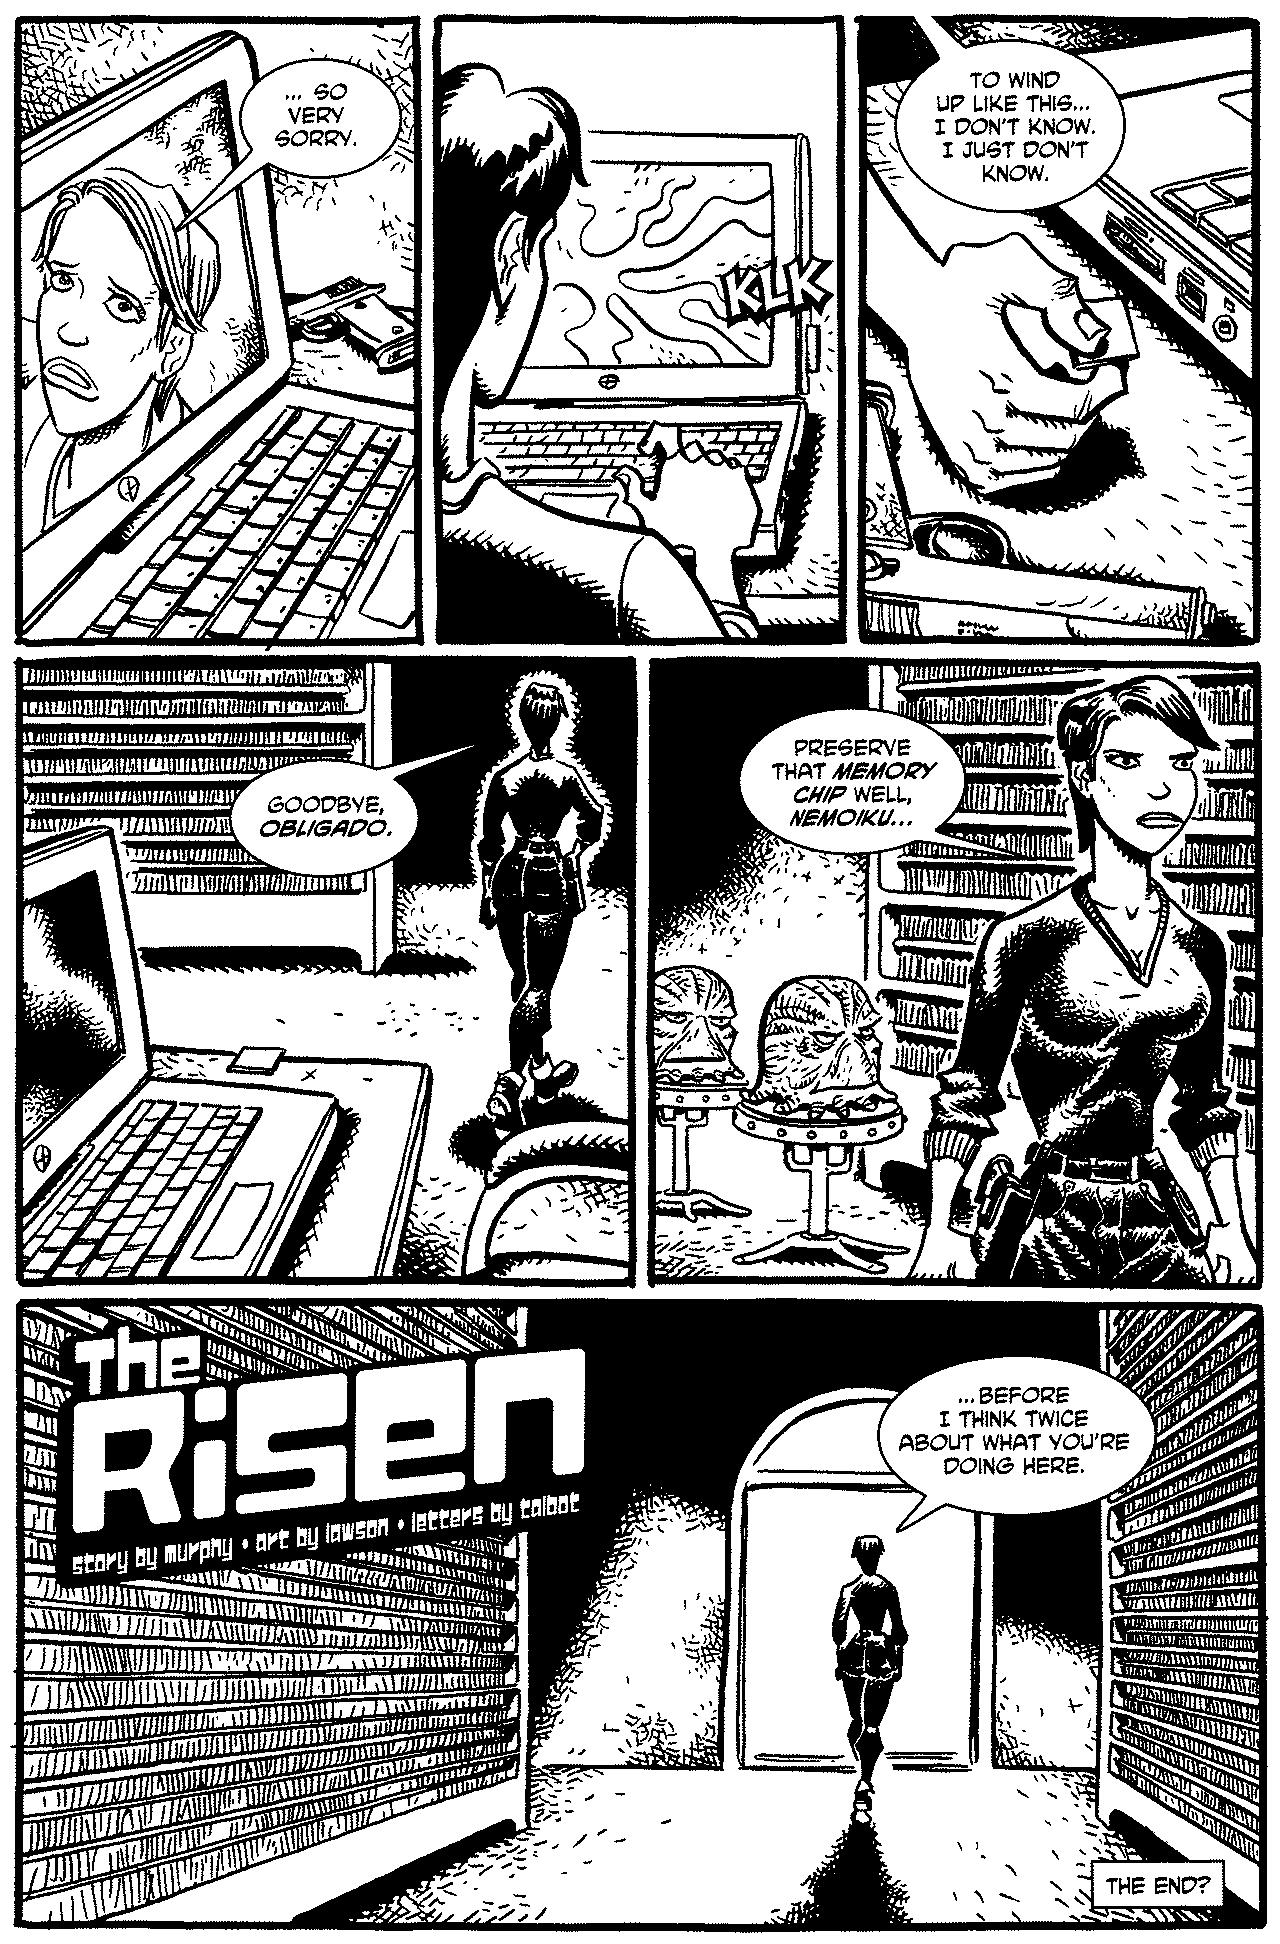 The Risen